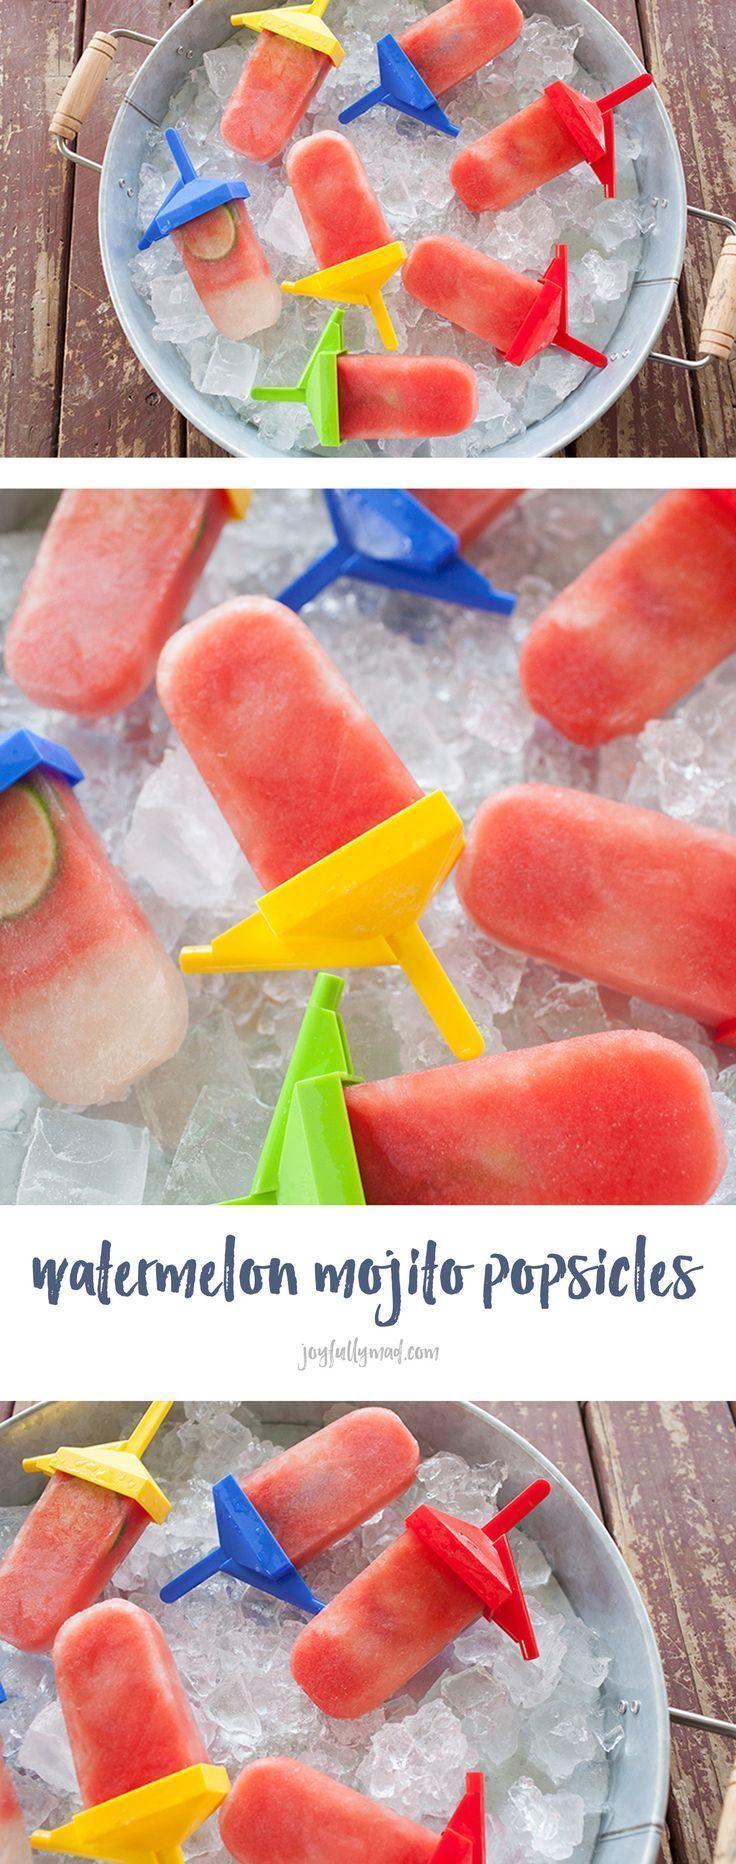 Wassermelonen Mojito Eis Am Stiel Stiel Wassermelonenmojitoeis Wassermelone Mojito Meloneneis